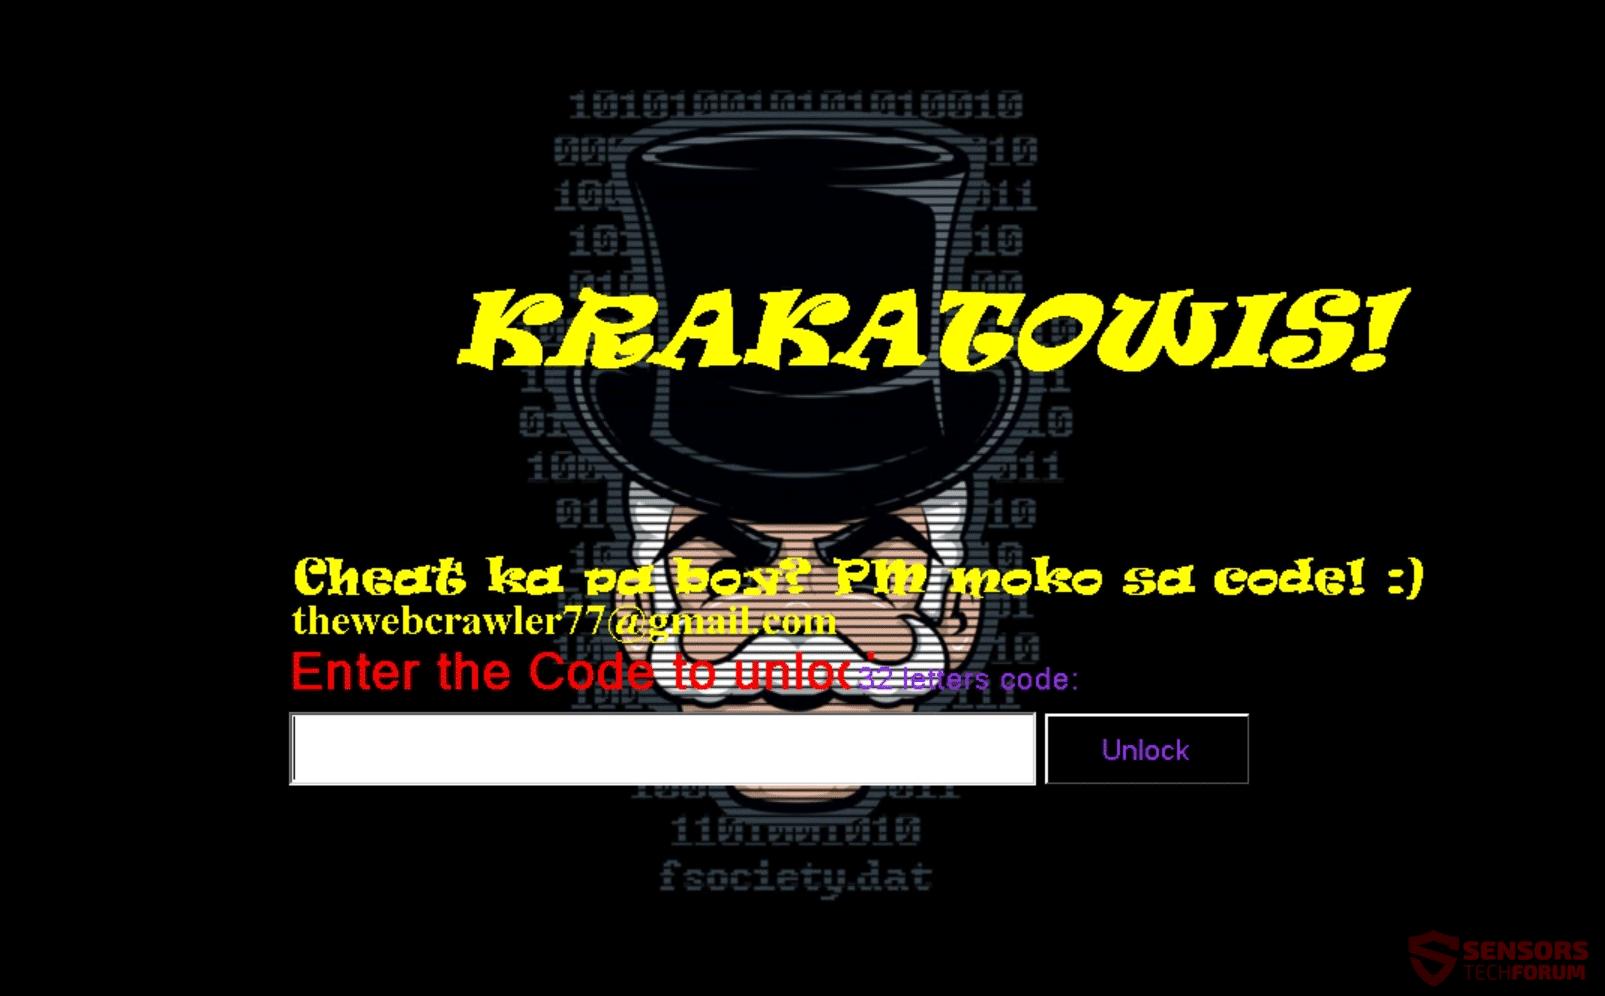 Retire Krakatowis ransomware - Restaurar archivos cifrados